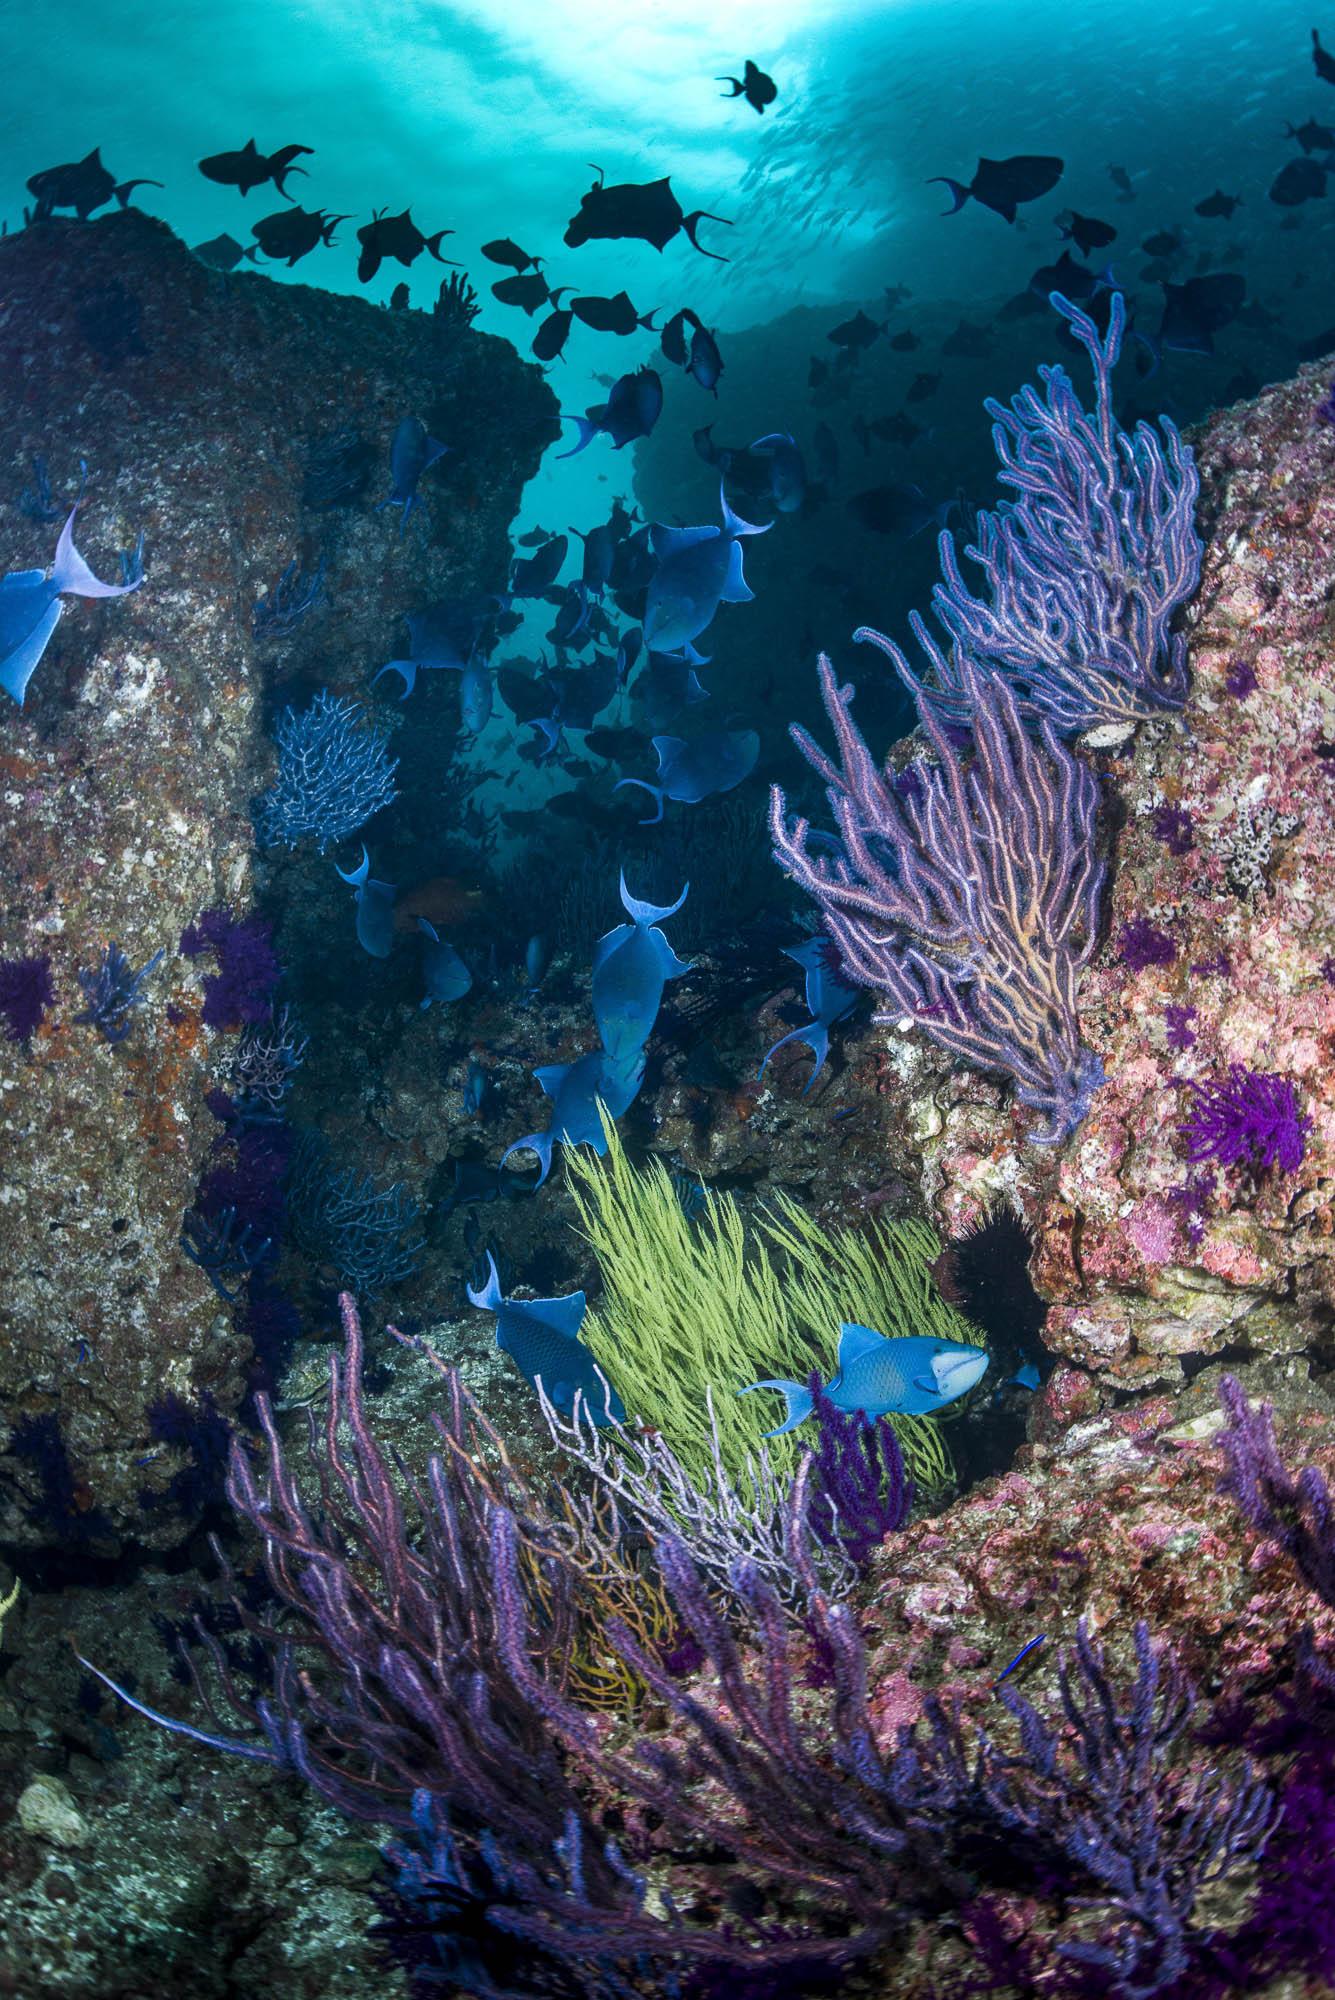 Musandam , Oman CREDIT: WARREN BAVERSTOCK / coral reef image bank